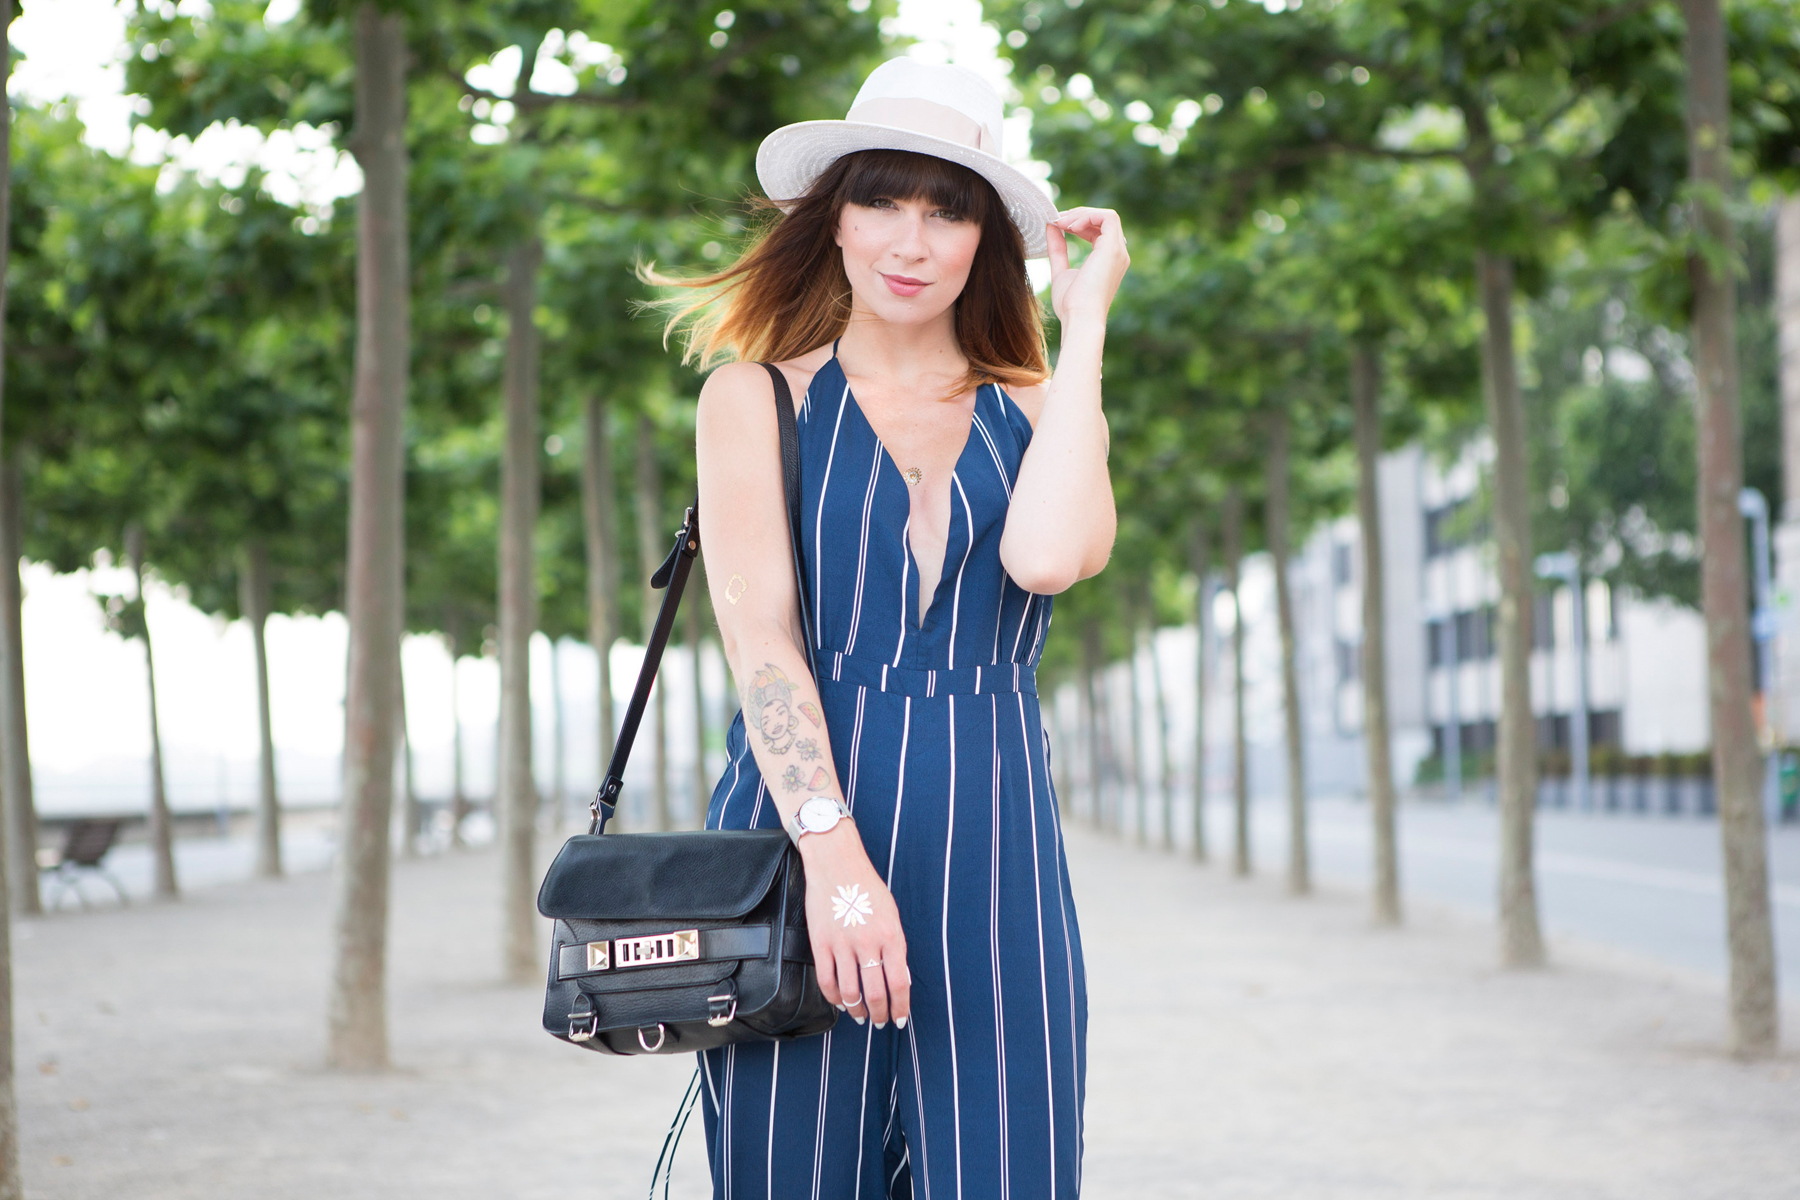 forever 21 jumpsuit overall streifen blue hat summer ombre cats & dogs ricarda schernus blogger berlin 3